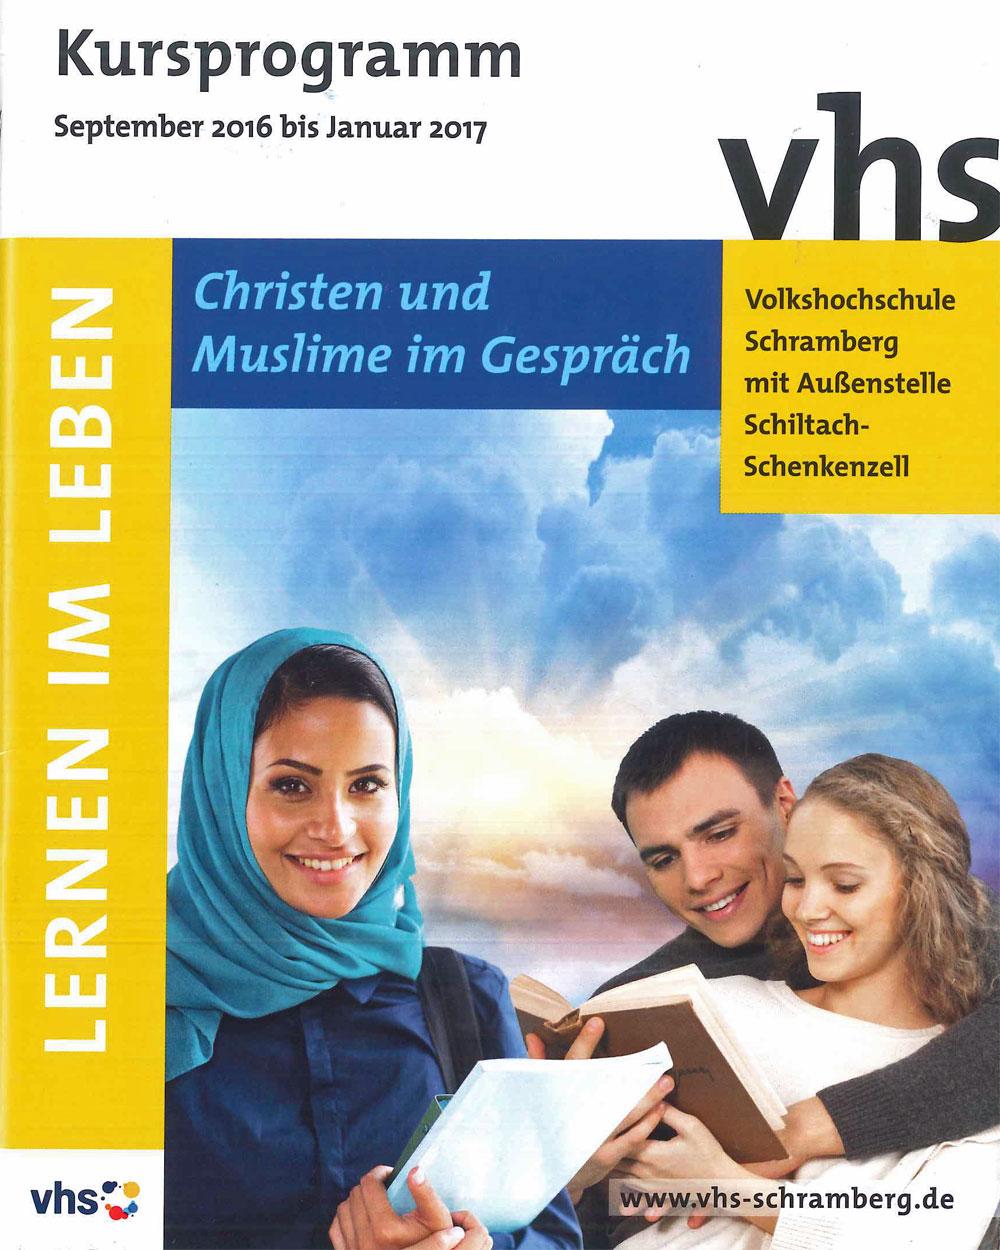 VHS-Programm-2016